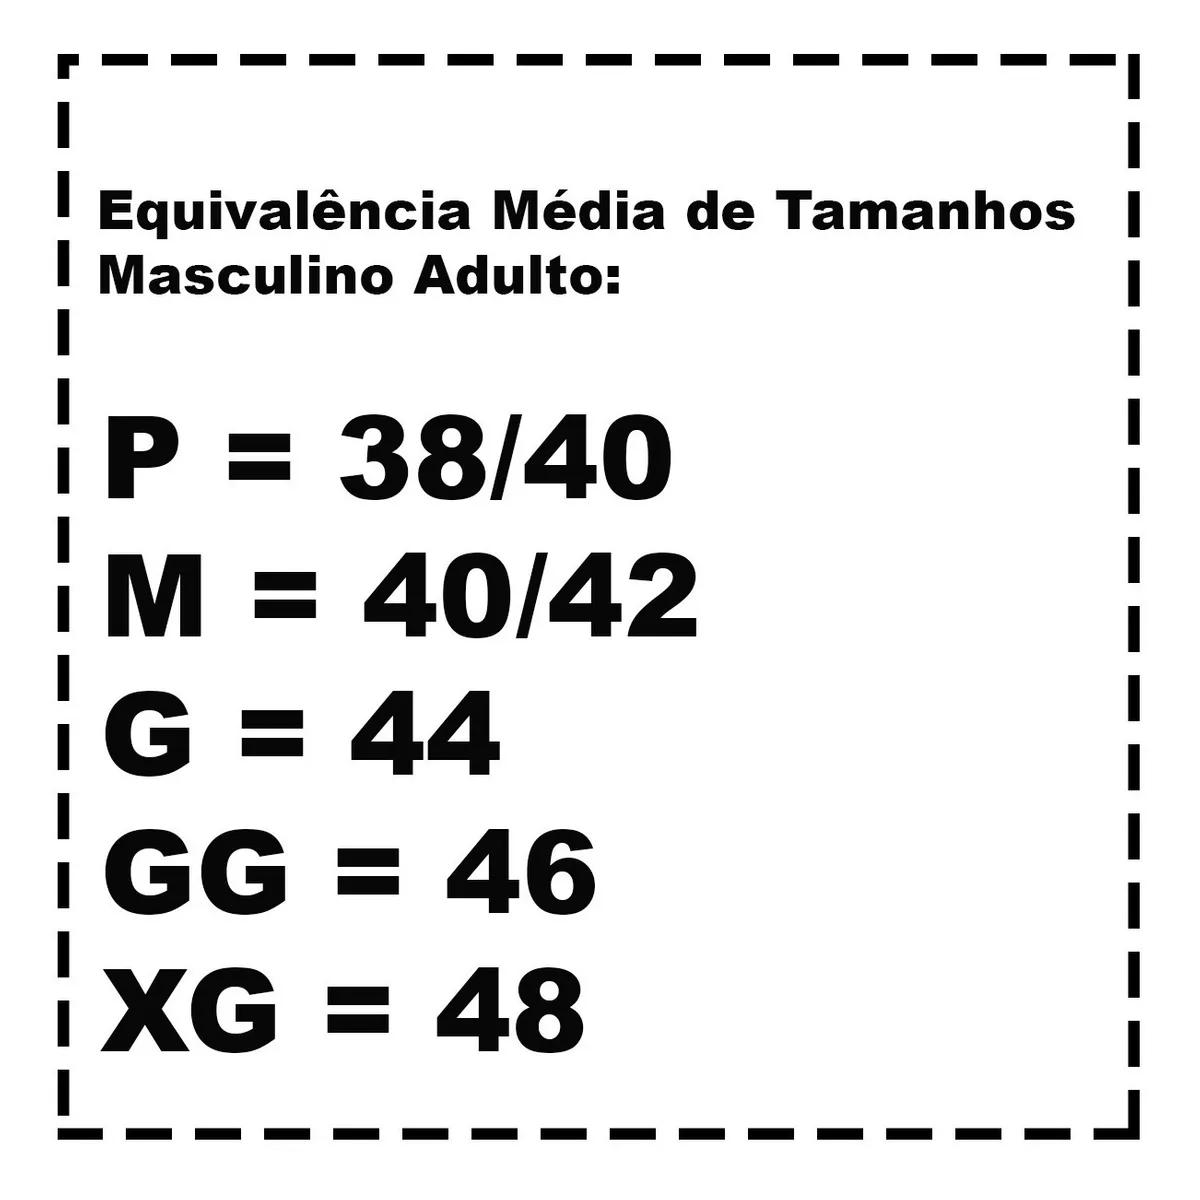 Kit 2 Samba Canção Estampa Sortida Cueca Short Liganete Masculino Adulto Ref: 4303